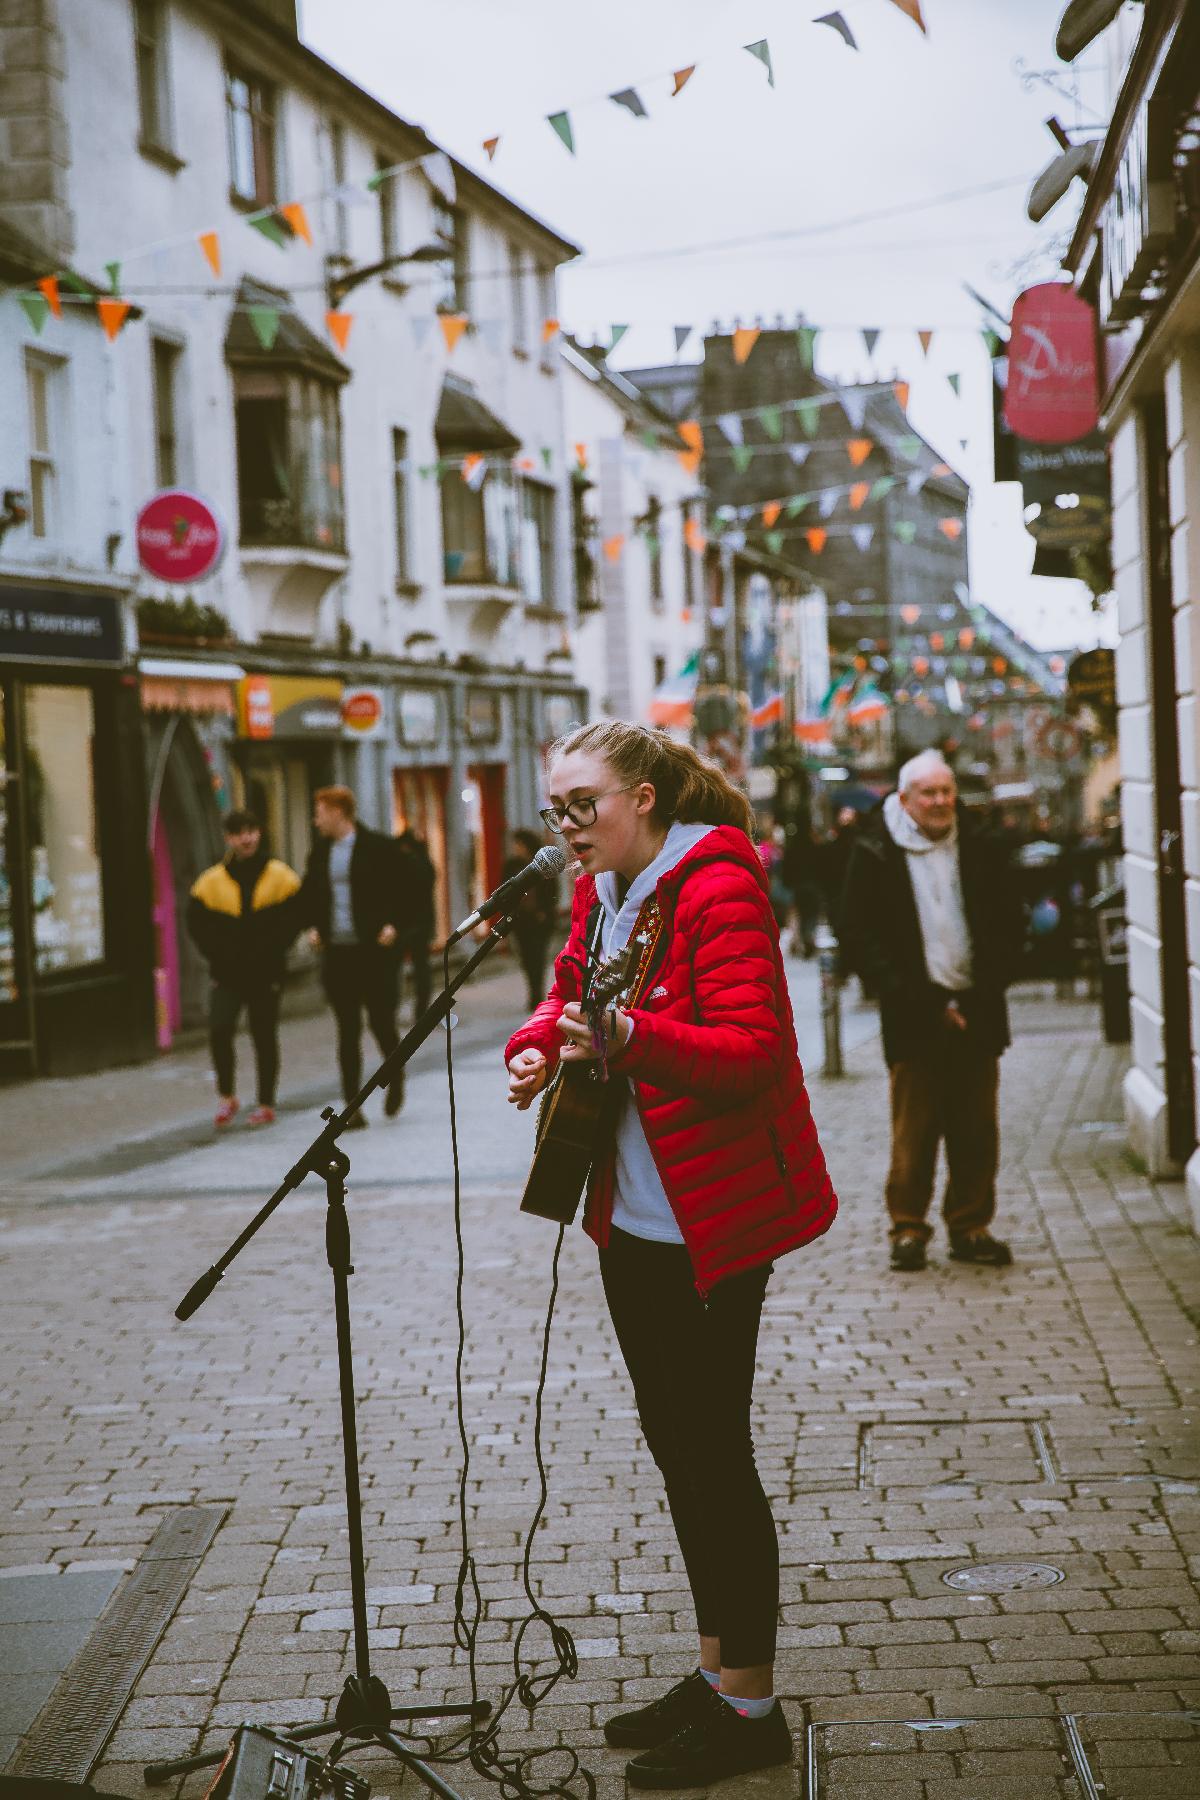 Galway Quay Street Performer